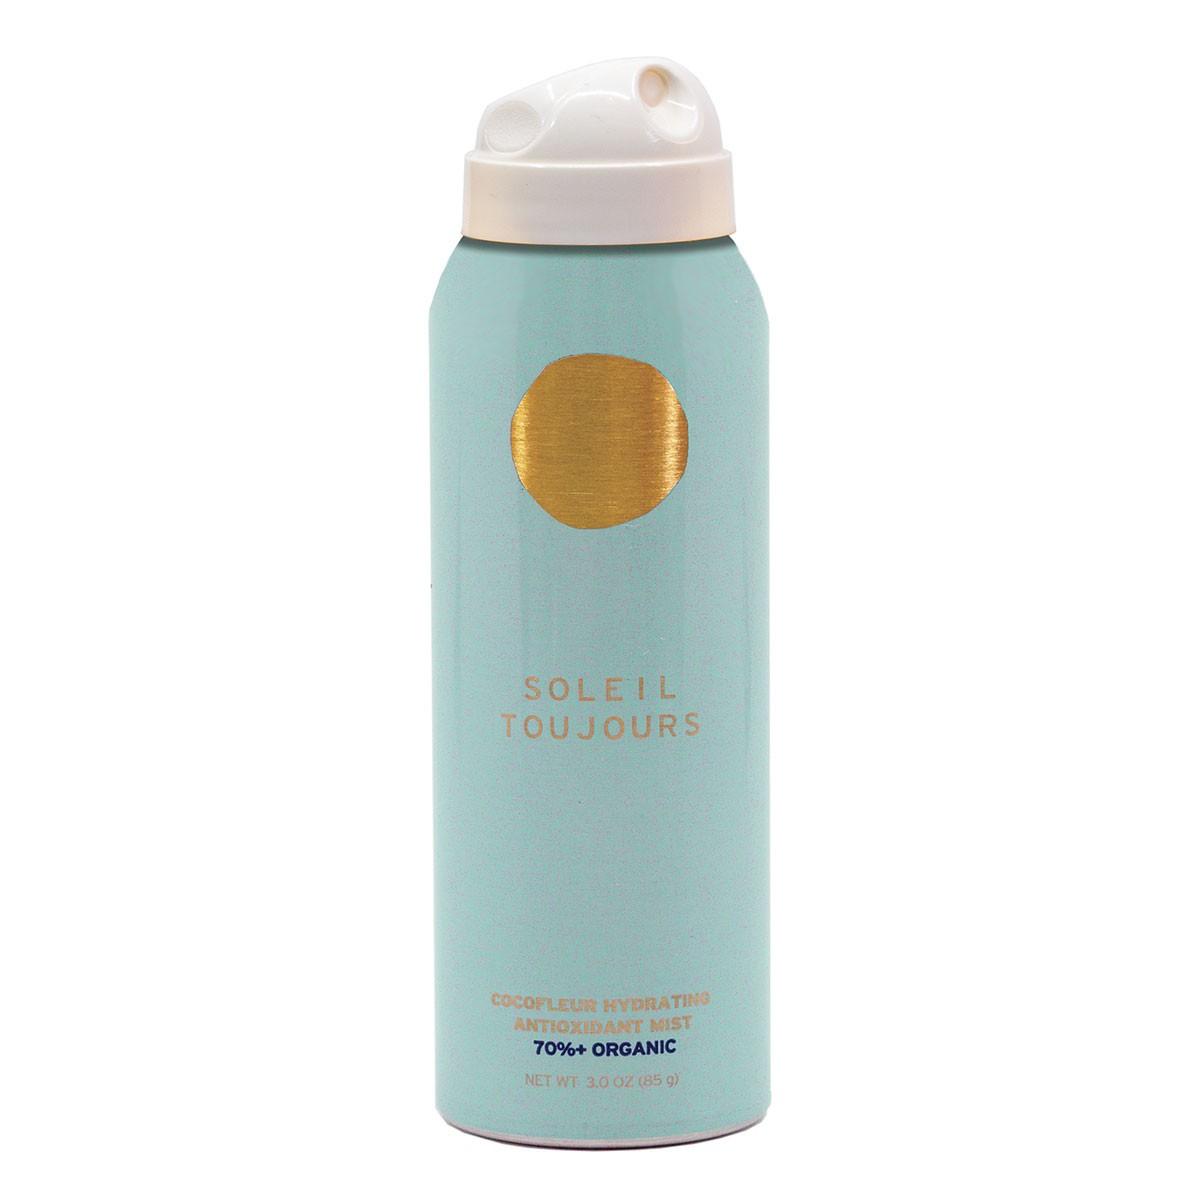 Soleil Toujours Cocofleur Hydrating Antioxidant Mist - aftersun en spray